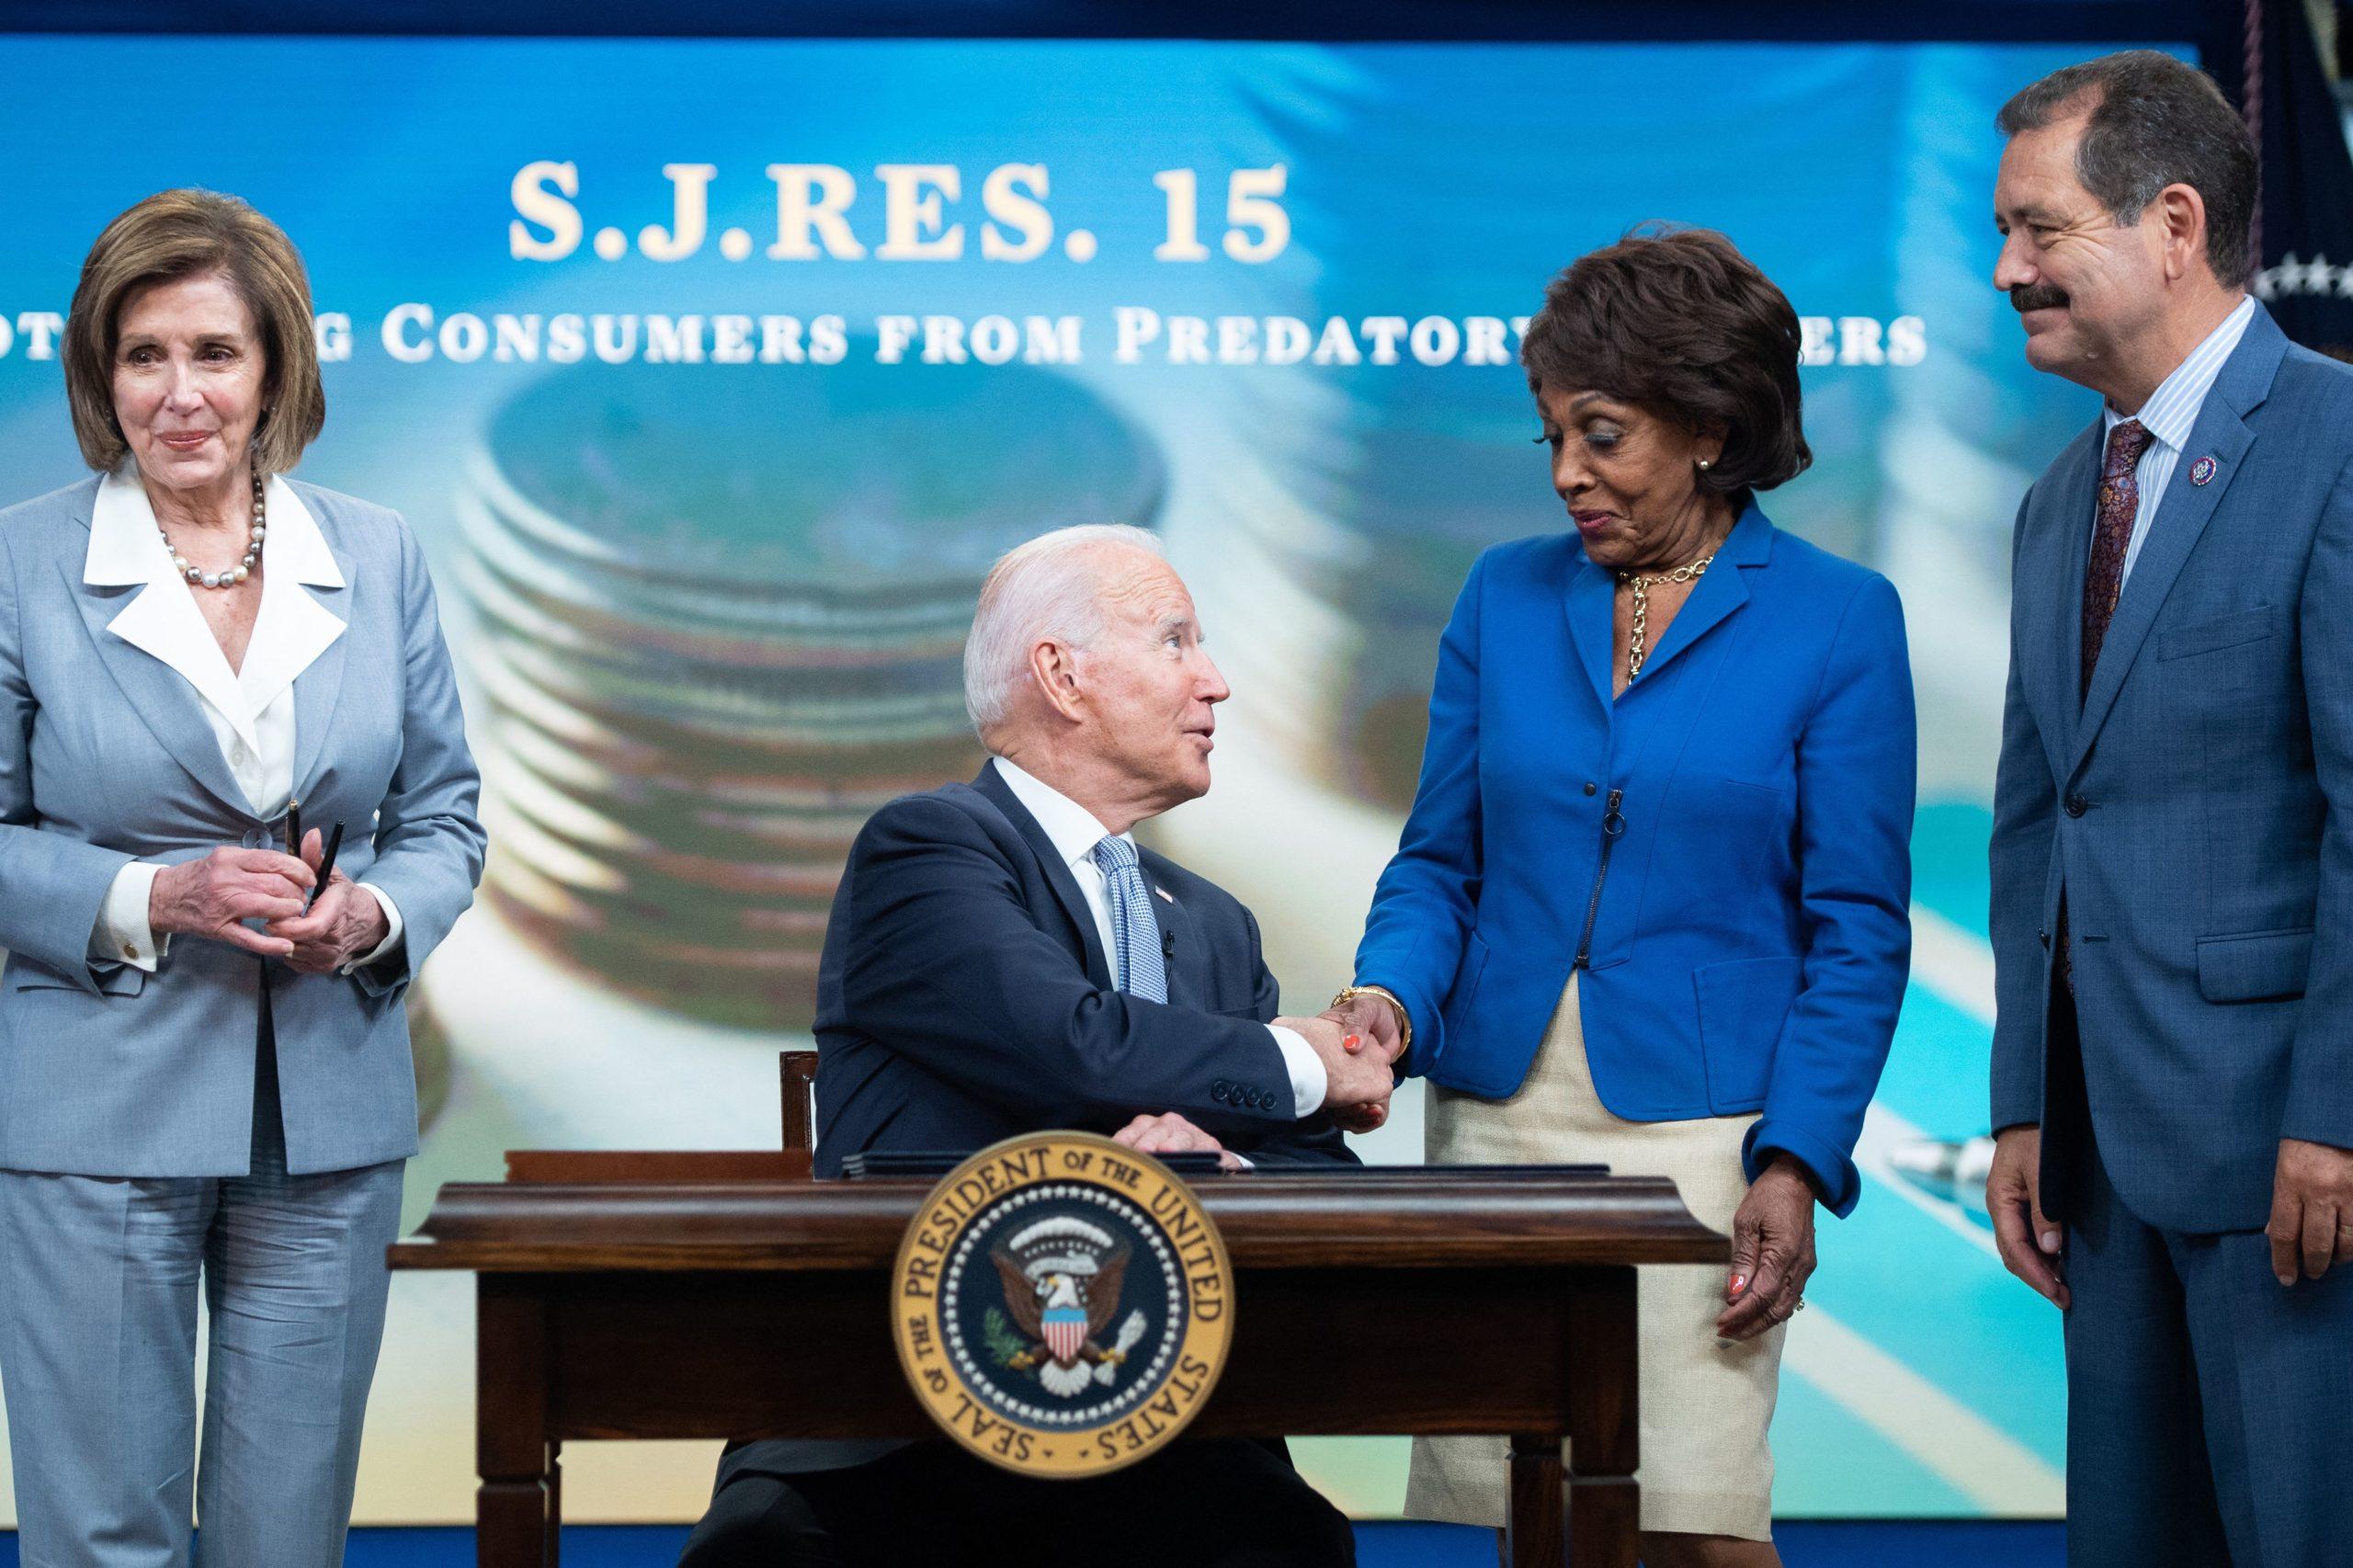 President Joe Biden sits alongside Speaker of the House Nancy Pelosi and Financial Services Chairwoman Maxine Waters on June 30. (Saul Loeb/AFP via Getty Images)